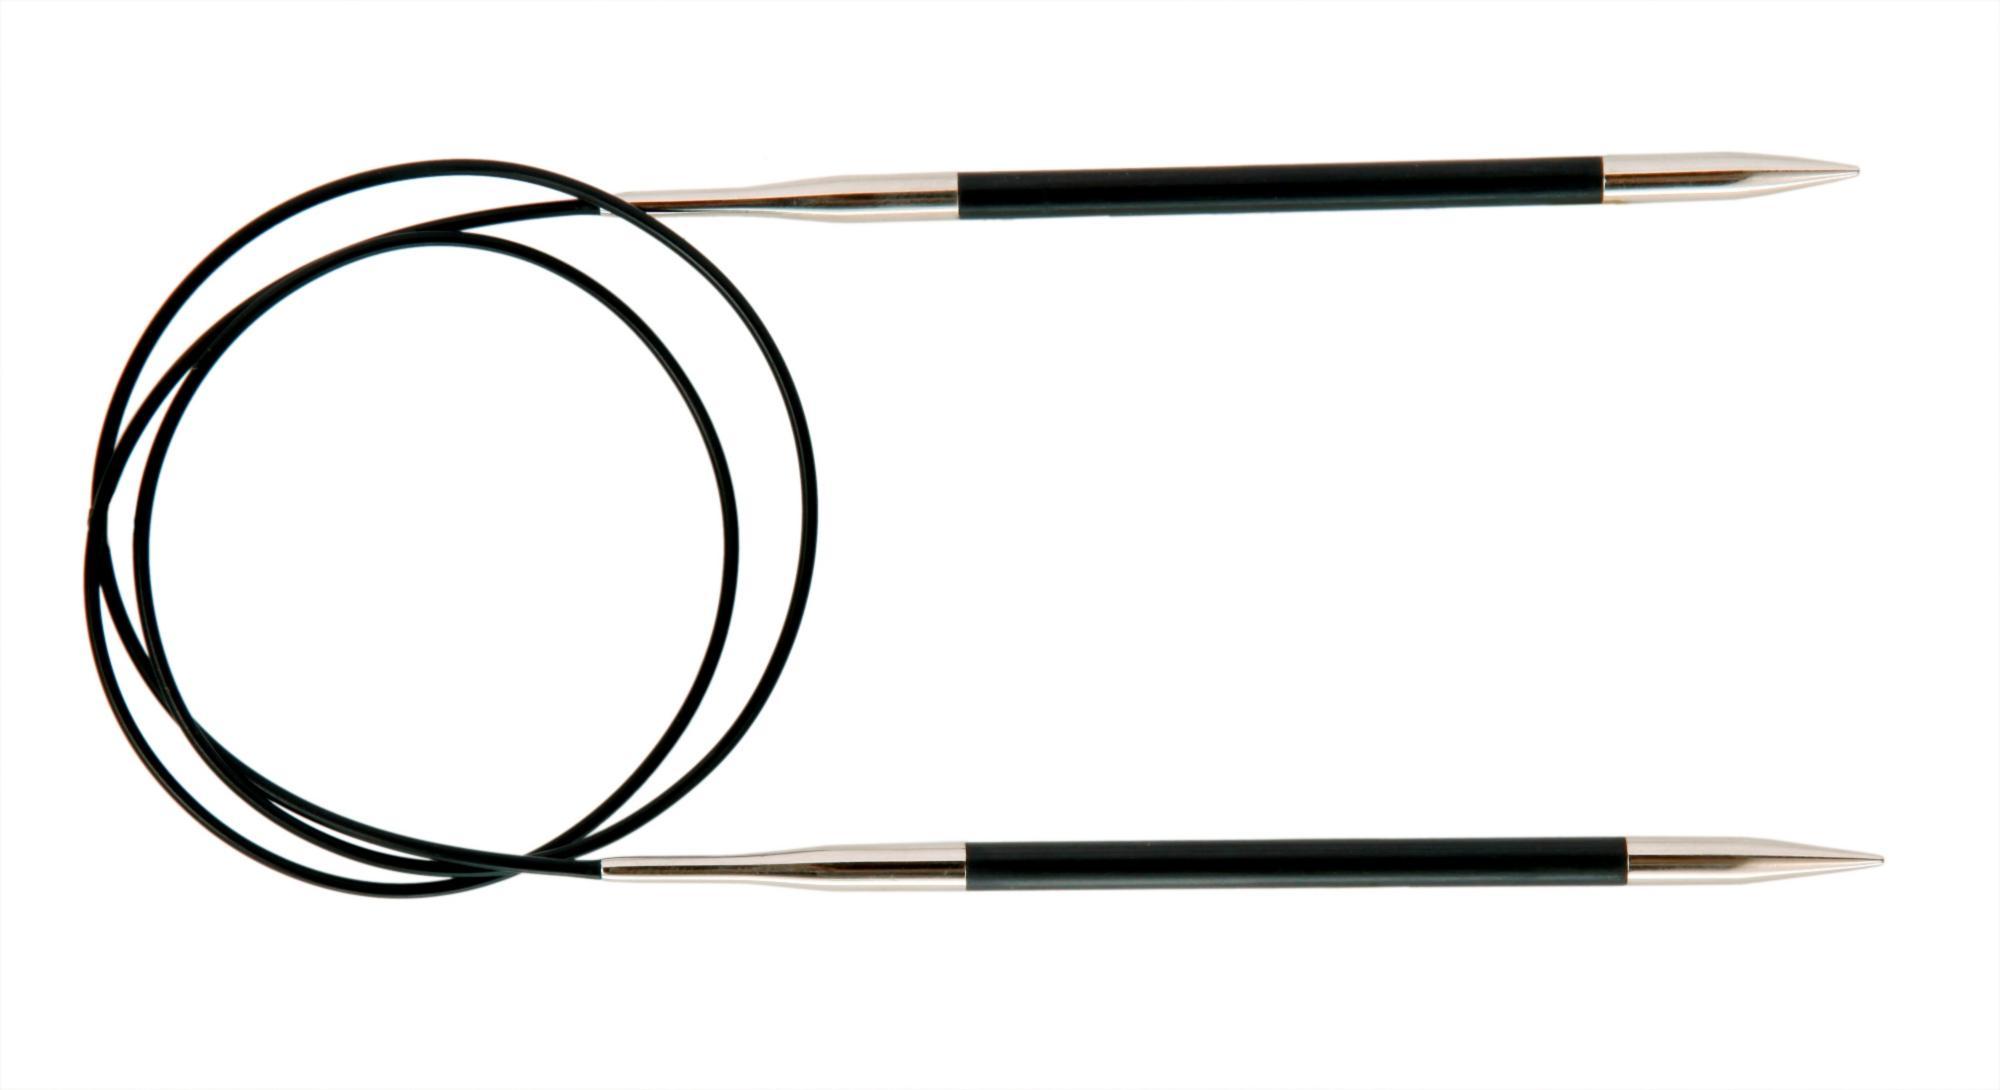 Спицы круговые 60 см Karbonz KnitPro, 41160, 2.00 мм